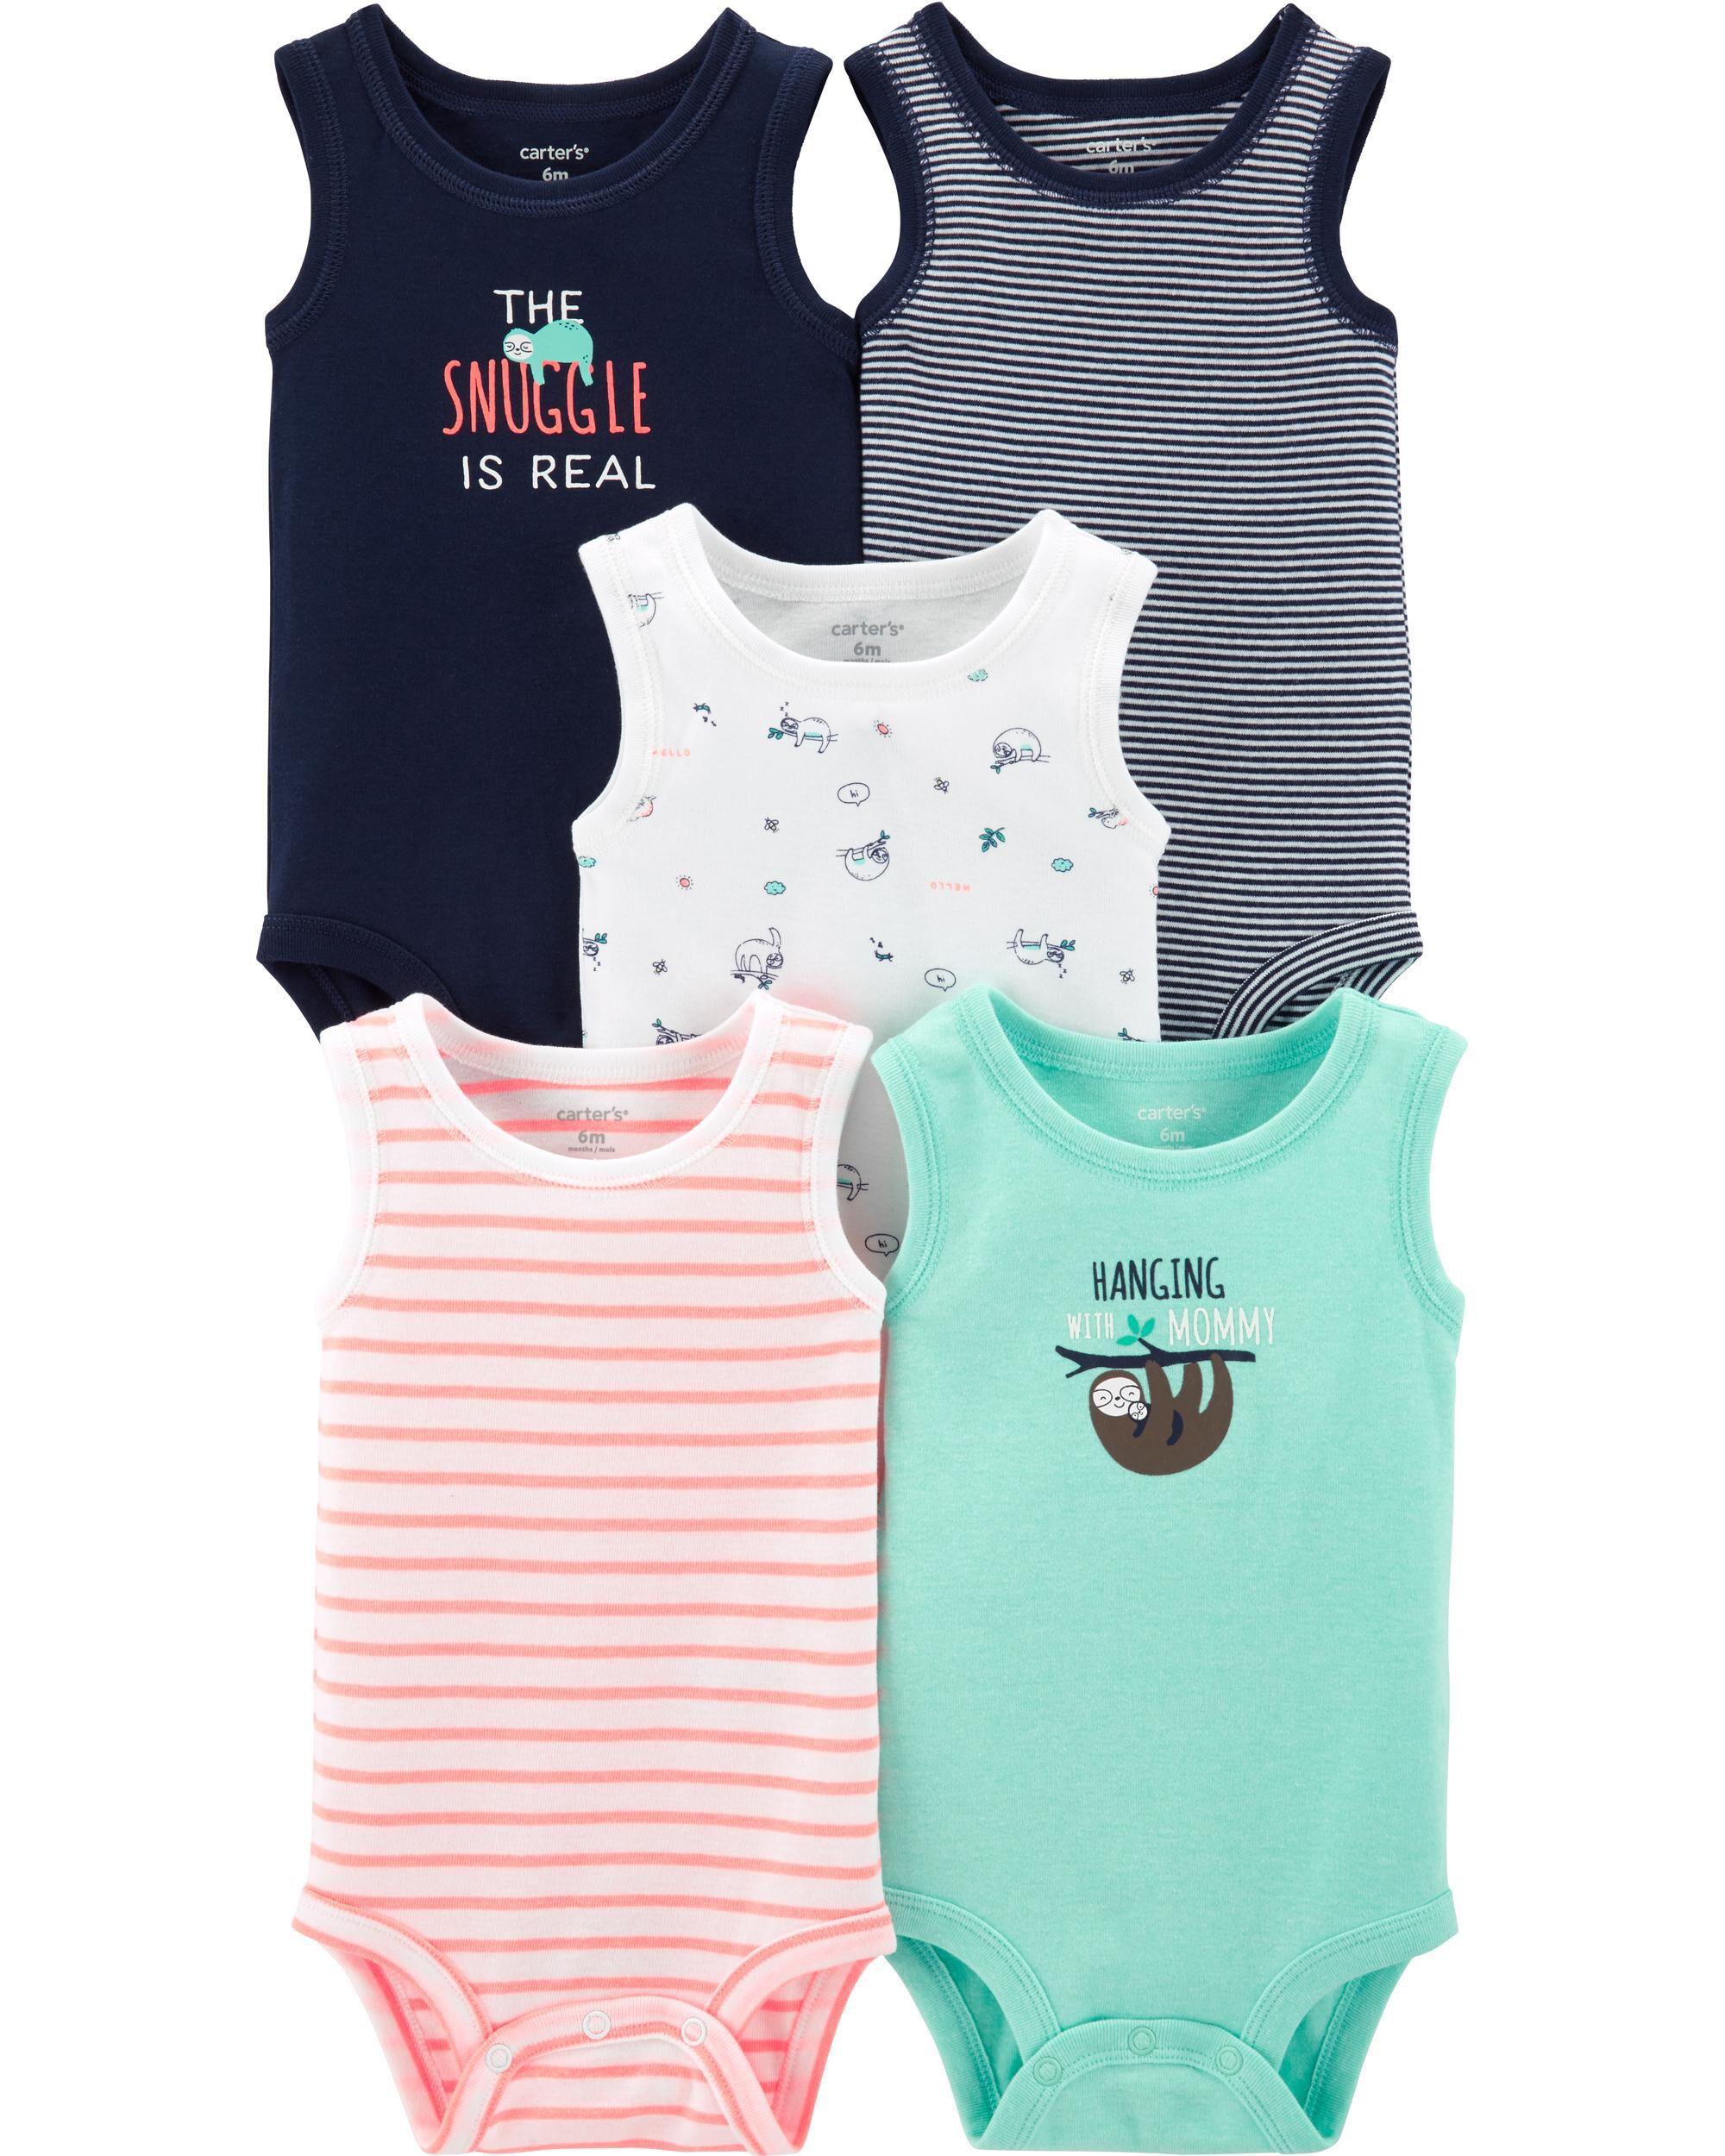 Carters Girls 2T-4 Printed Sleeveless Tank Top